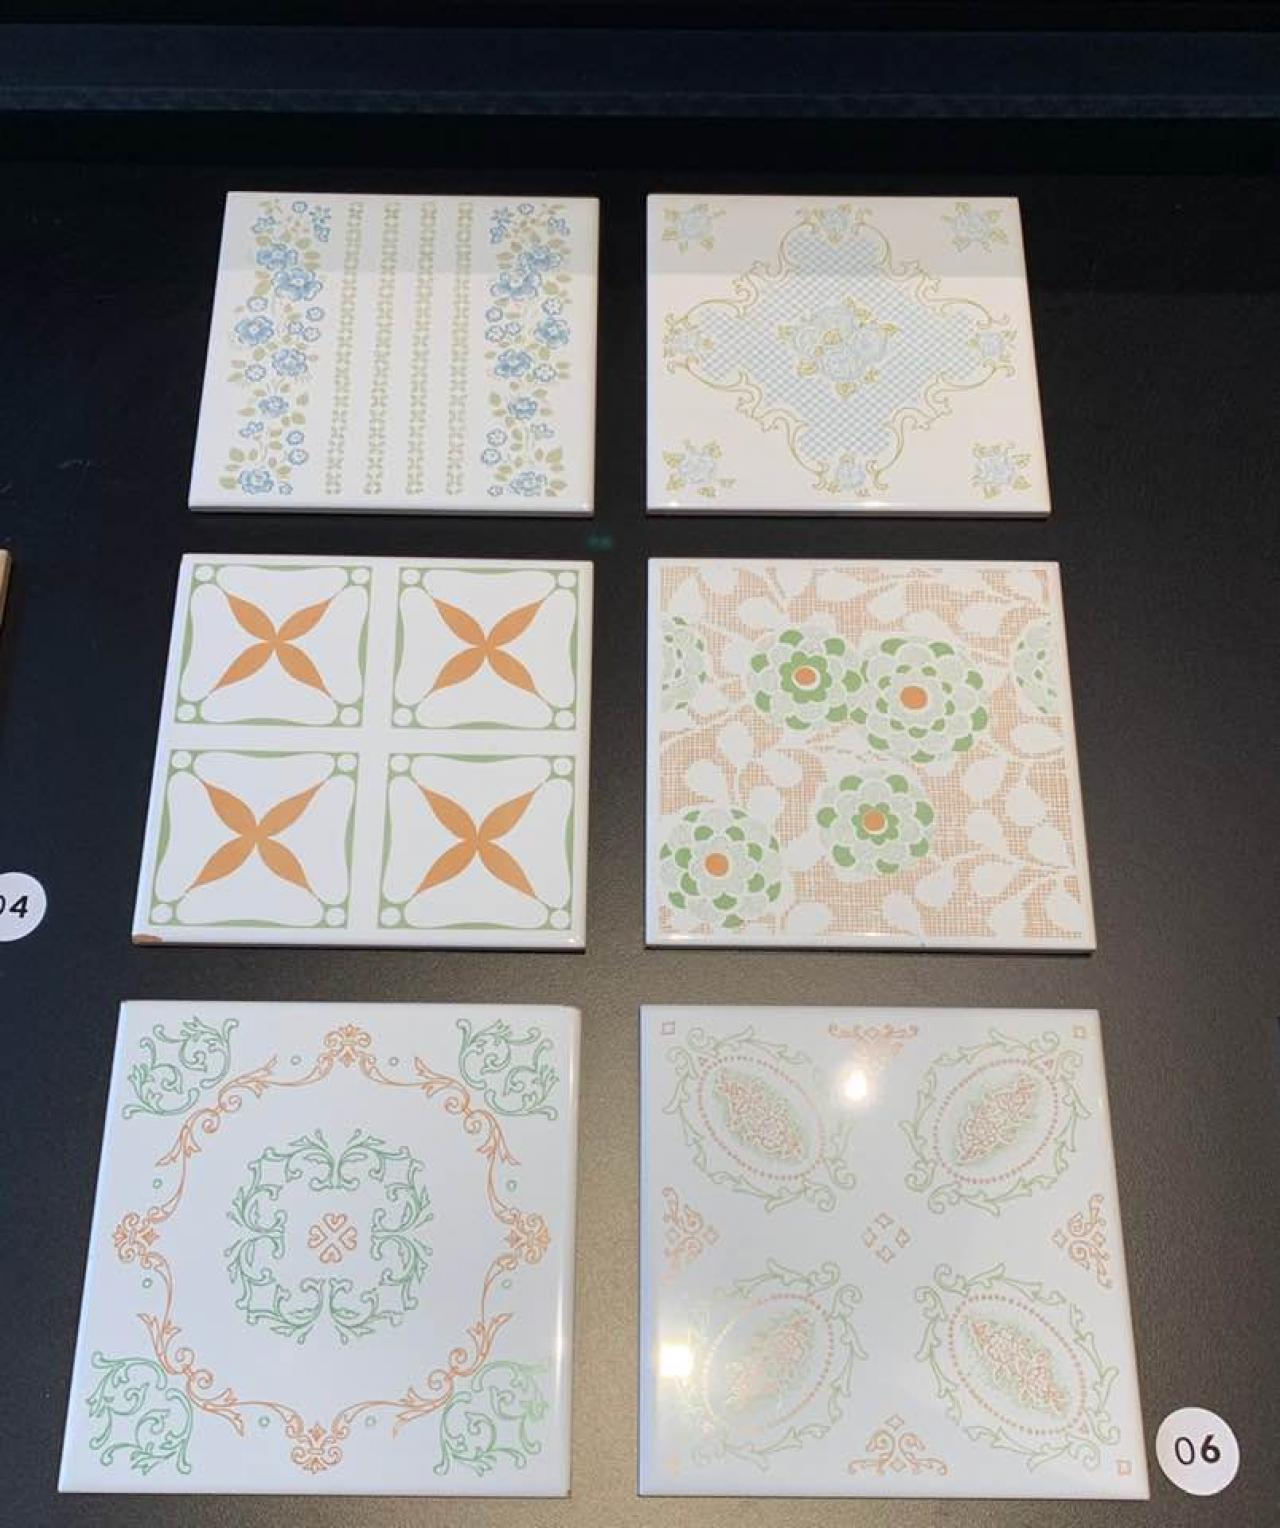 Piastrelle Decorative Per Tavoli piastrella ceramica: storia dalle origini al 1900 | fratelli